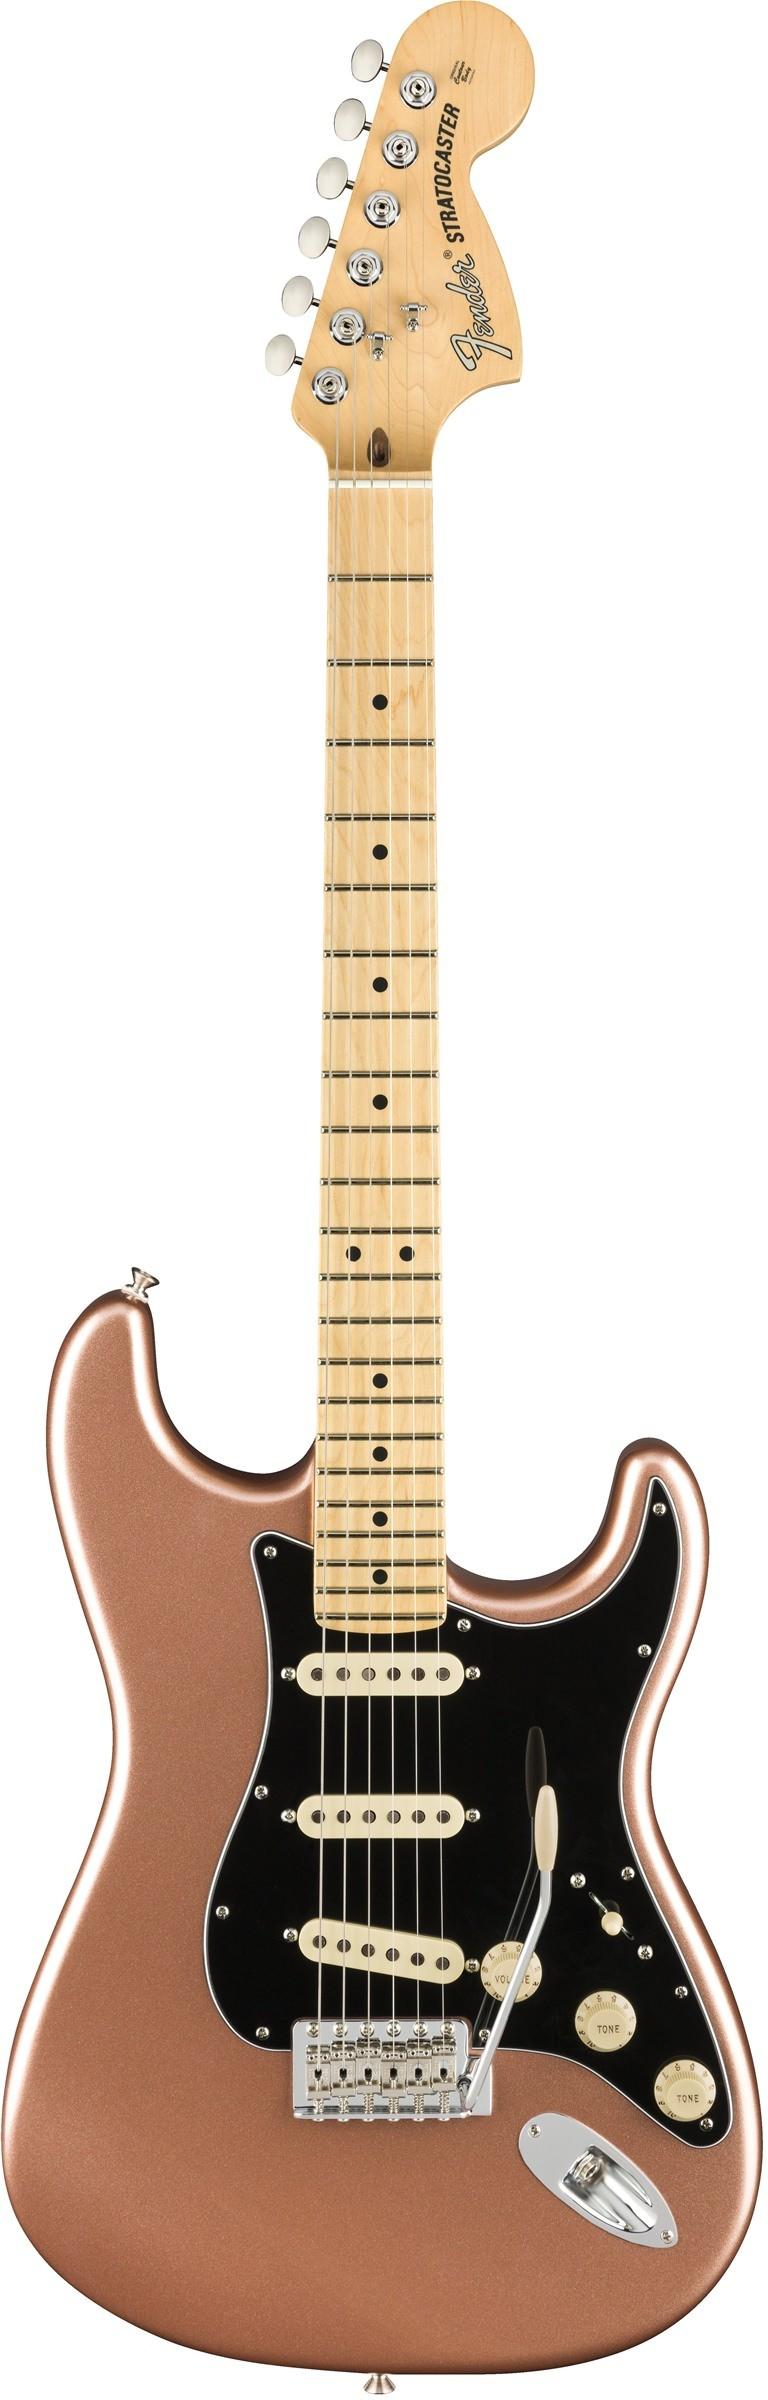 Электрогитара Fender American Performer Stratocaster Maple Fingerboard Penny